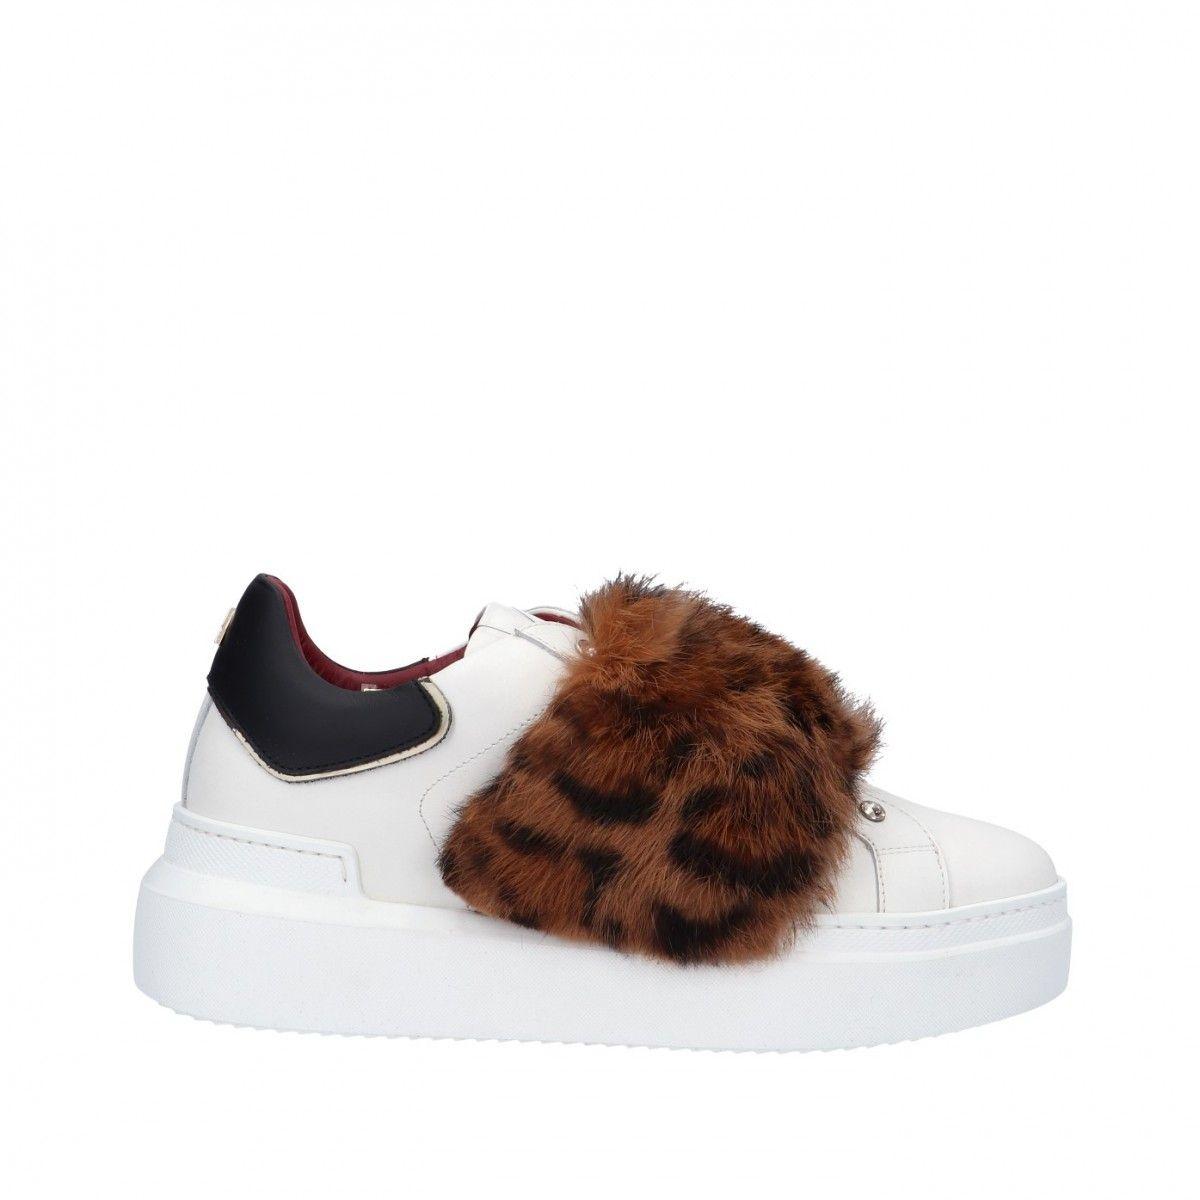 Ed parrish Sneaker Bianco/animalier Gomma CKLD-FA42